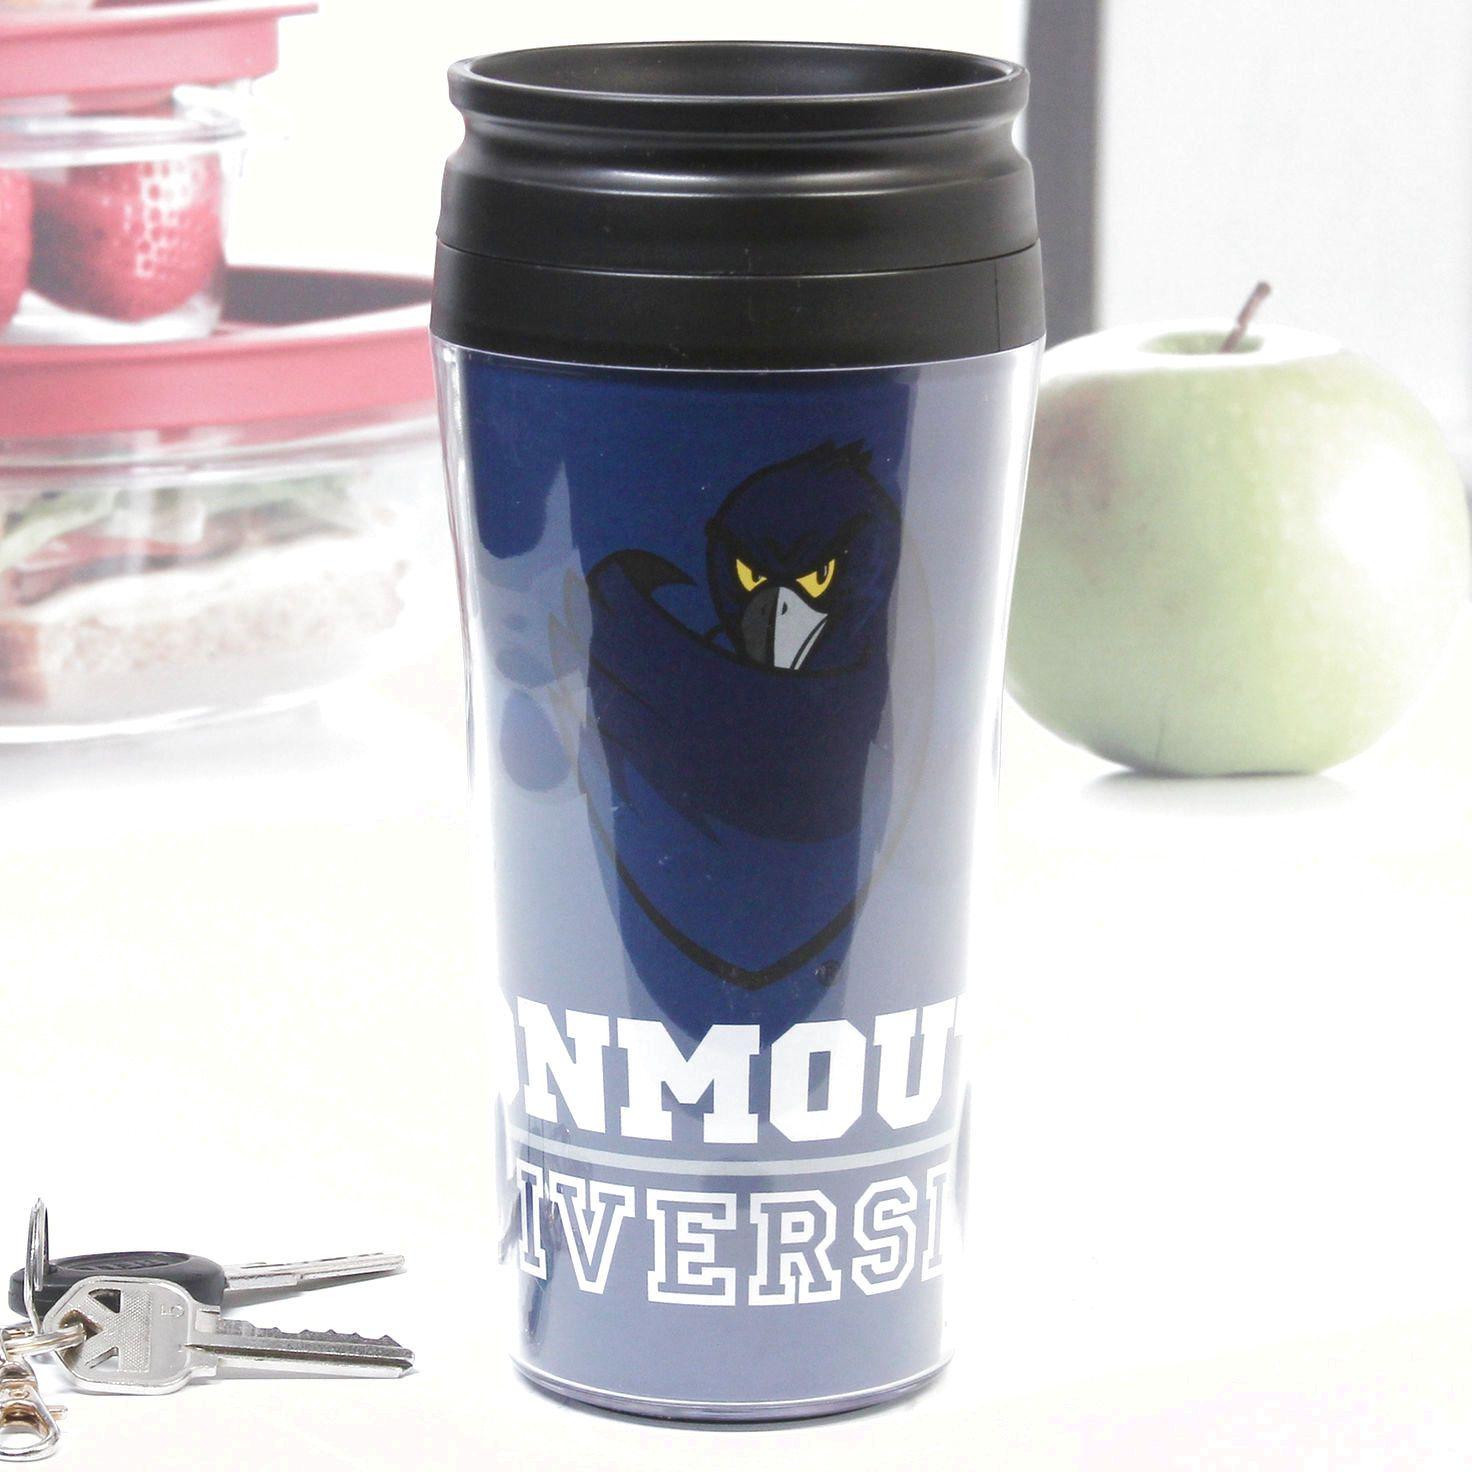 Monmouth Hawks 16oz. Tier Travel Mug with Lid - $10.44